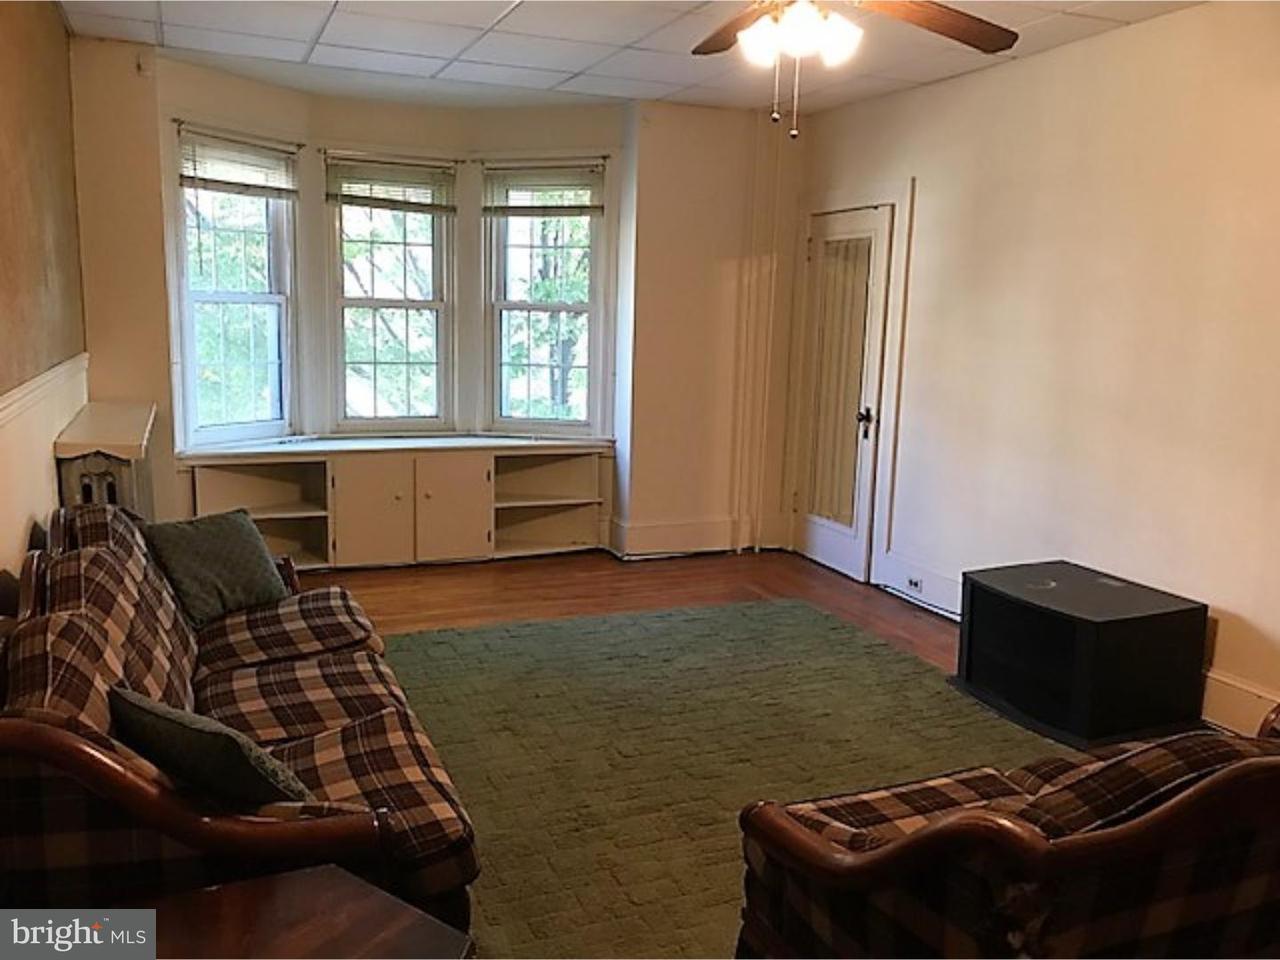 Casa Unifamiliar por un Alquiler en 103 E MAIN ST #UNIT 2 Schuylkill Haven, Pennsylvania 17972 Estados Unidos